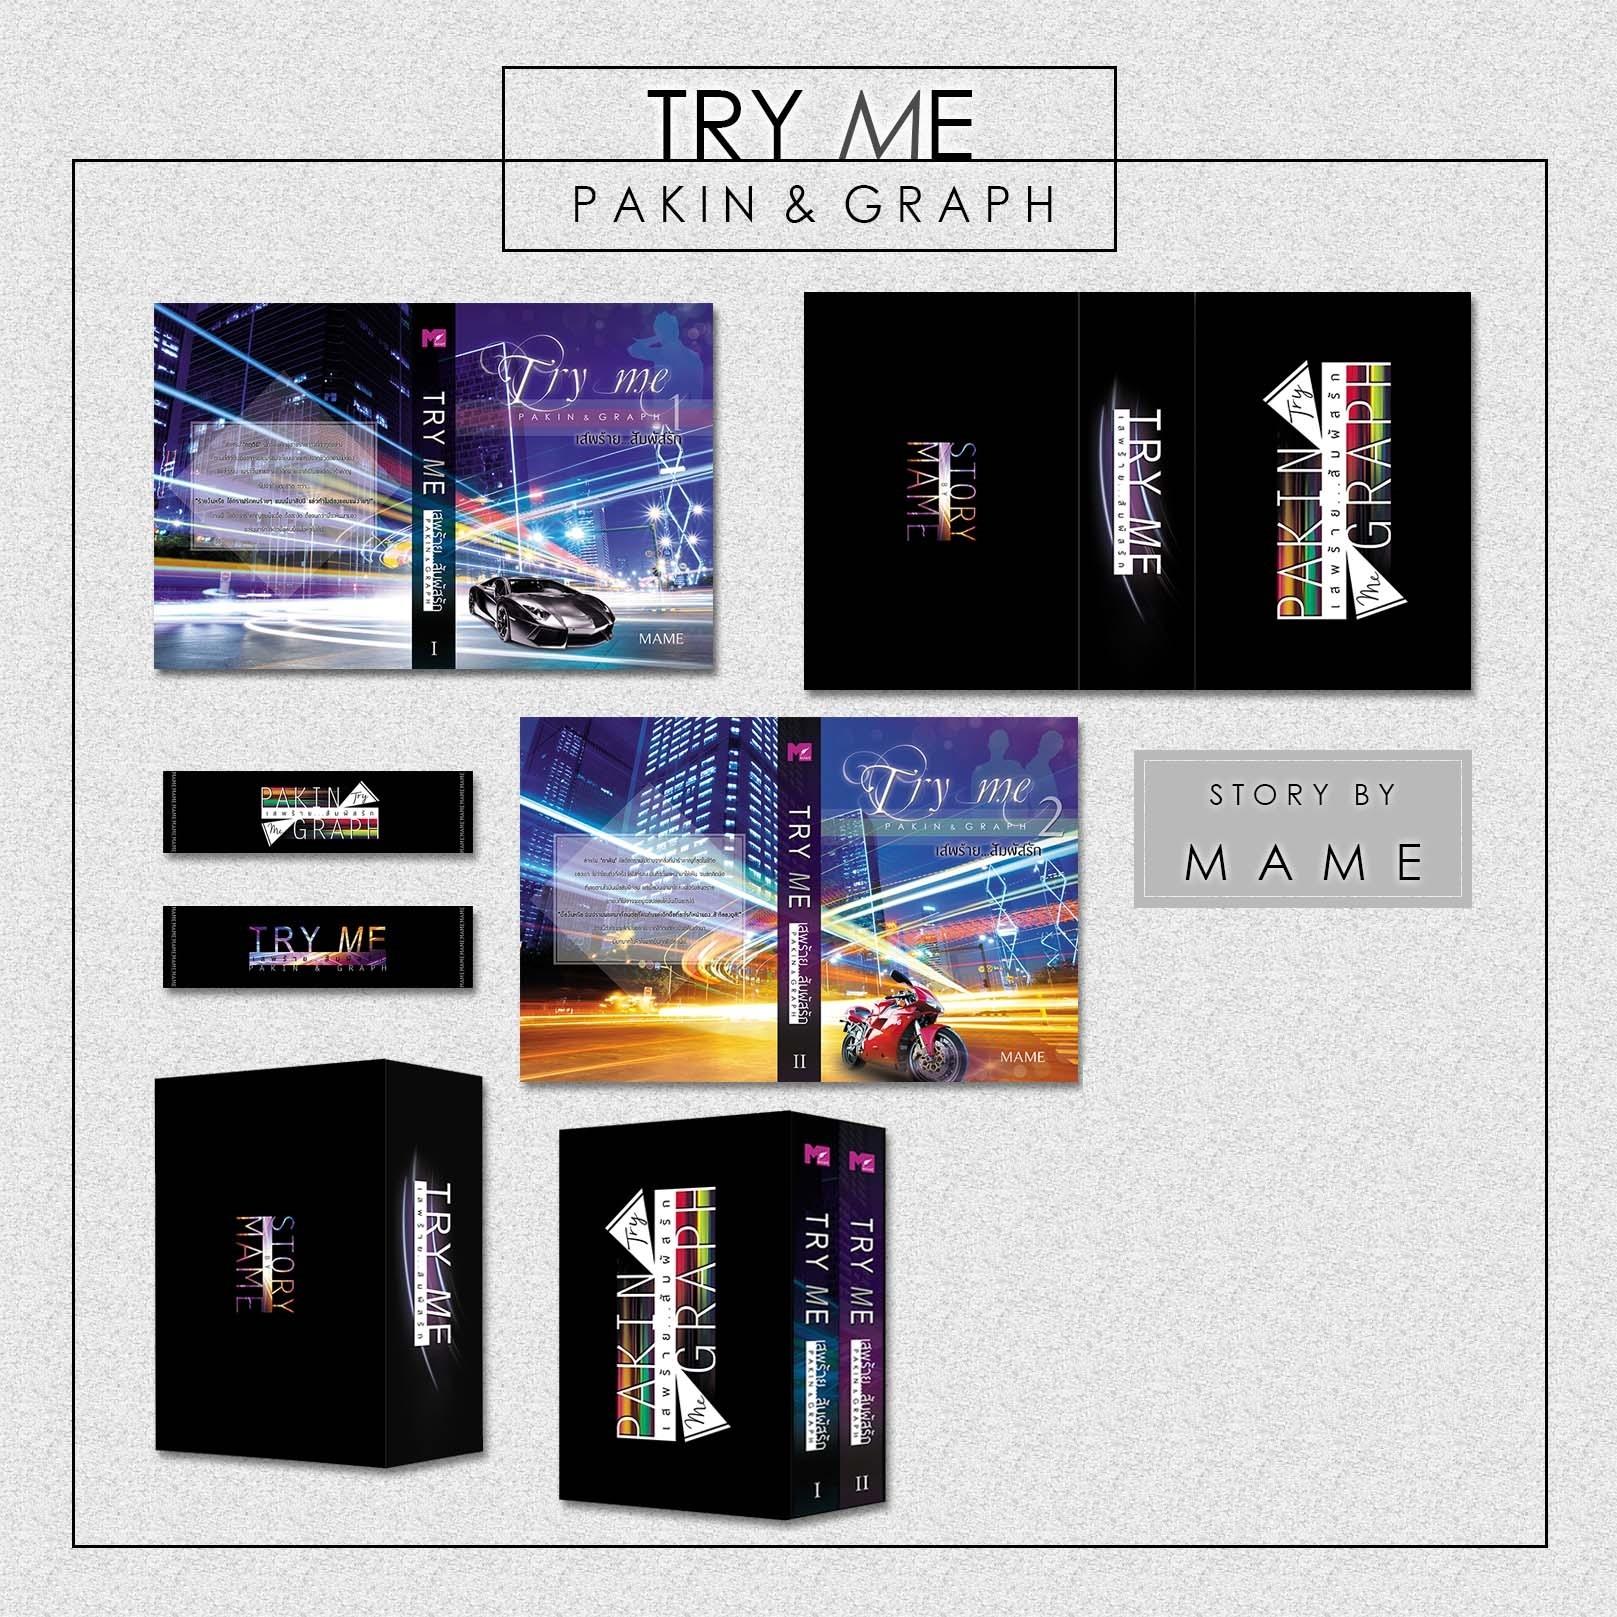 Boxset Try Me เสพร้าย...สัมผัสรัก by Mame